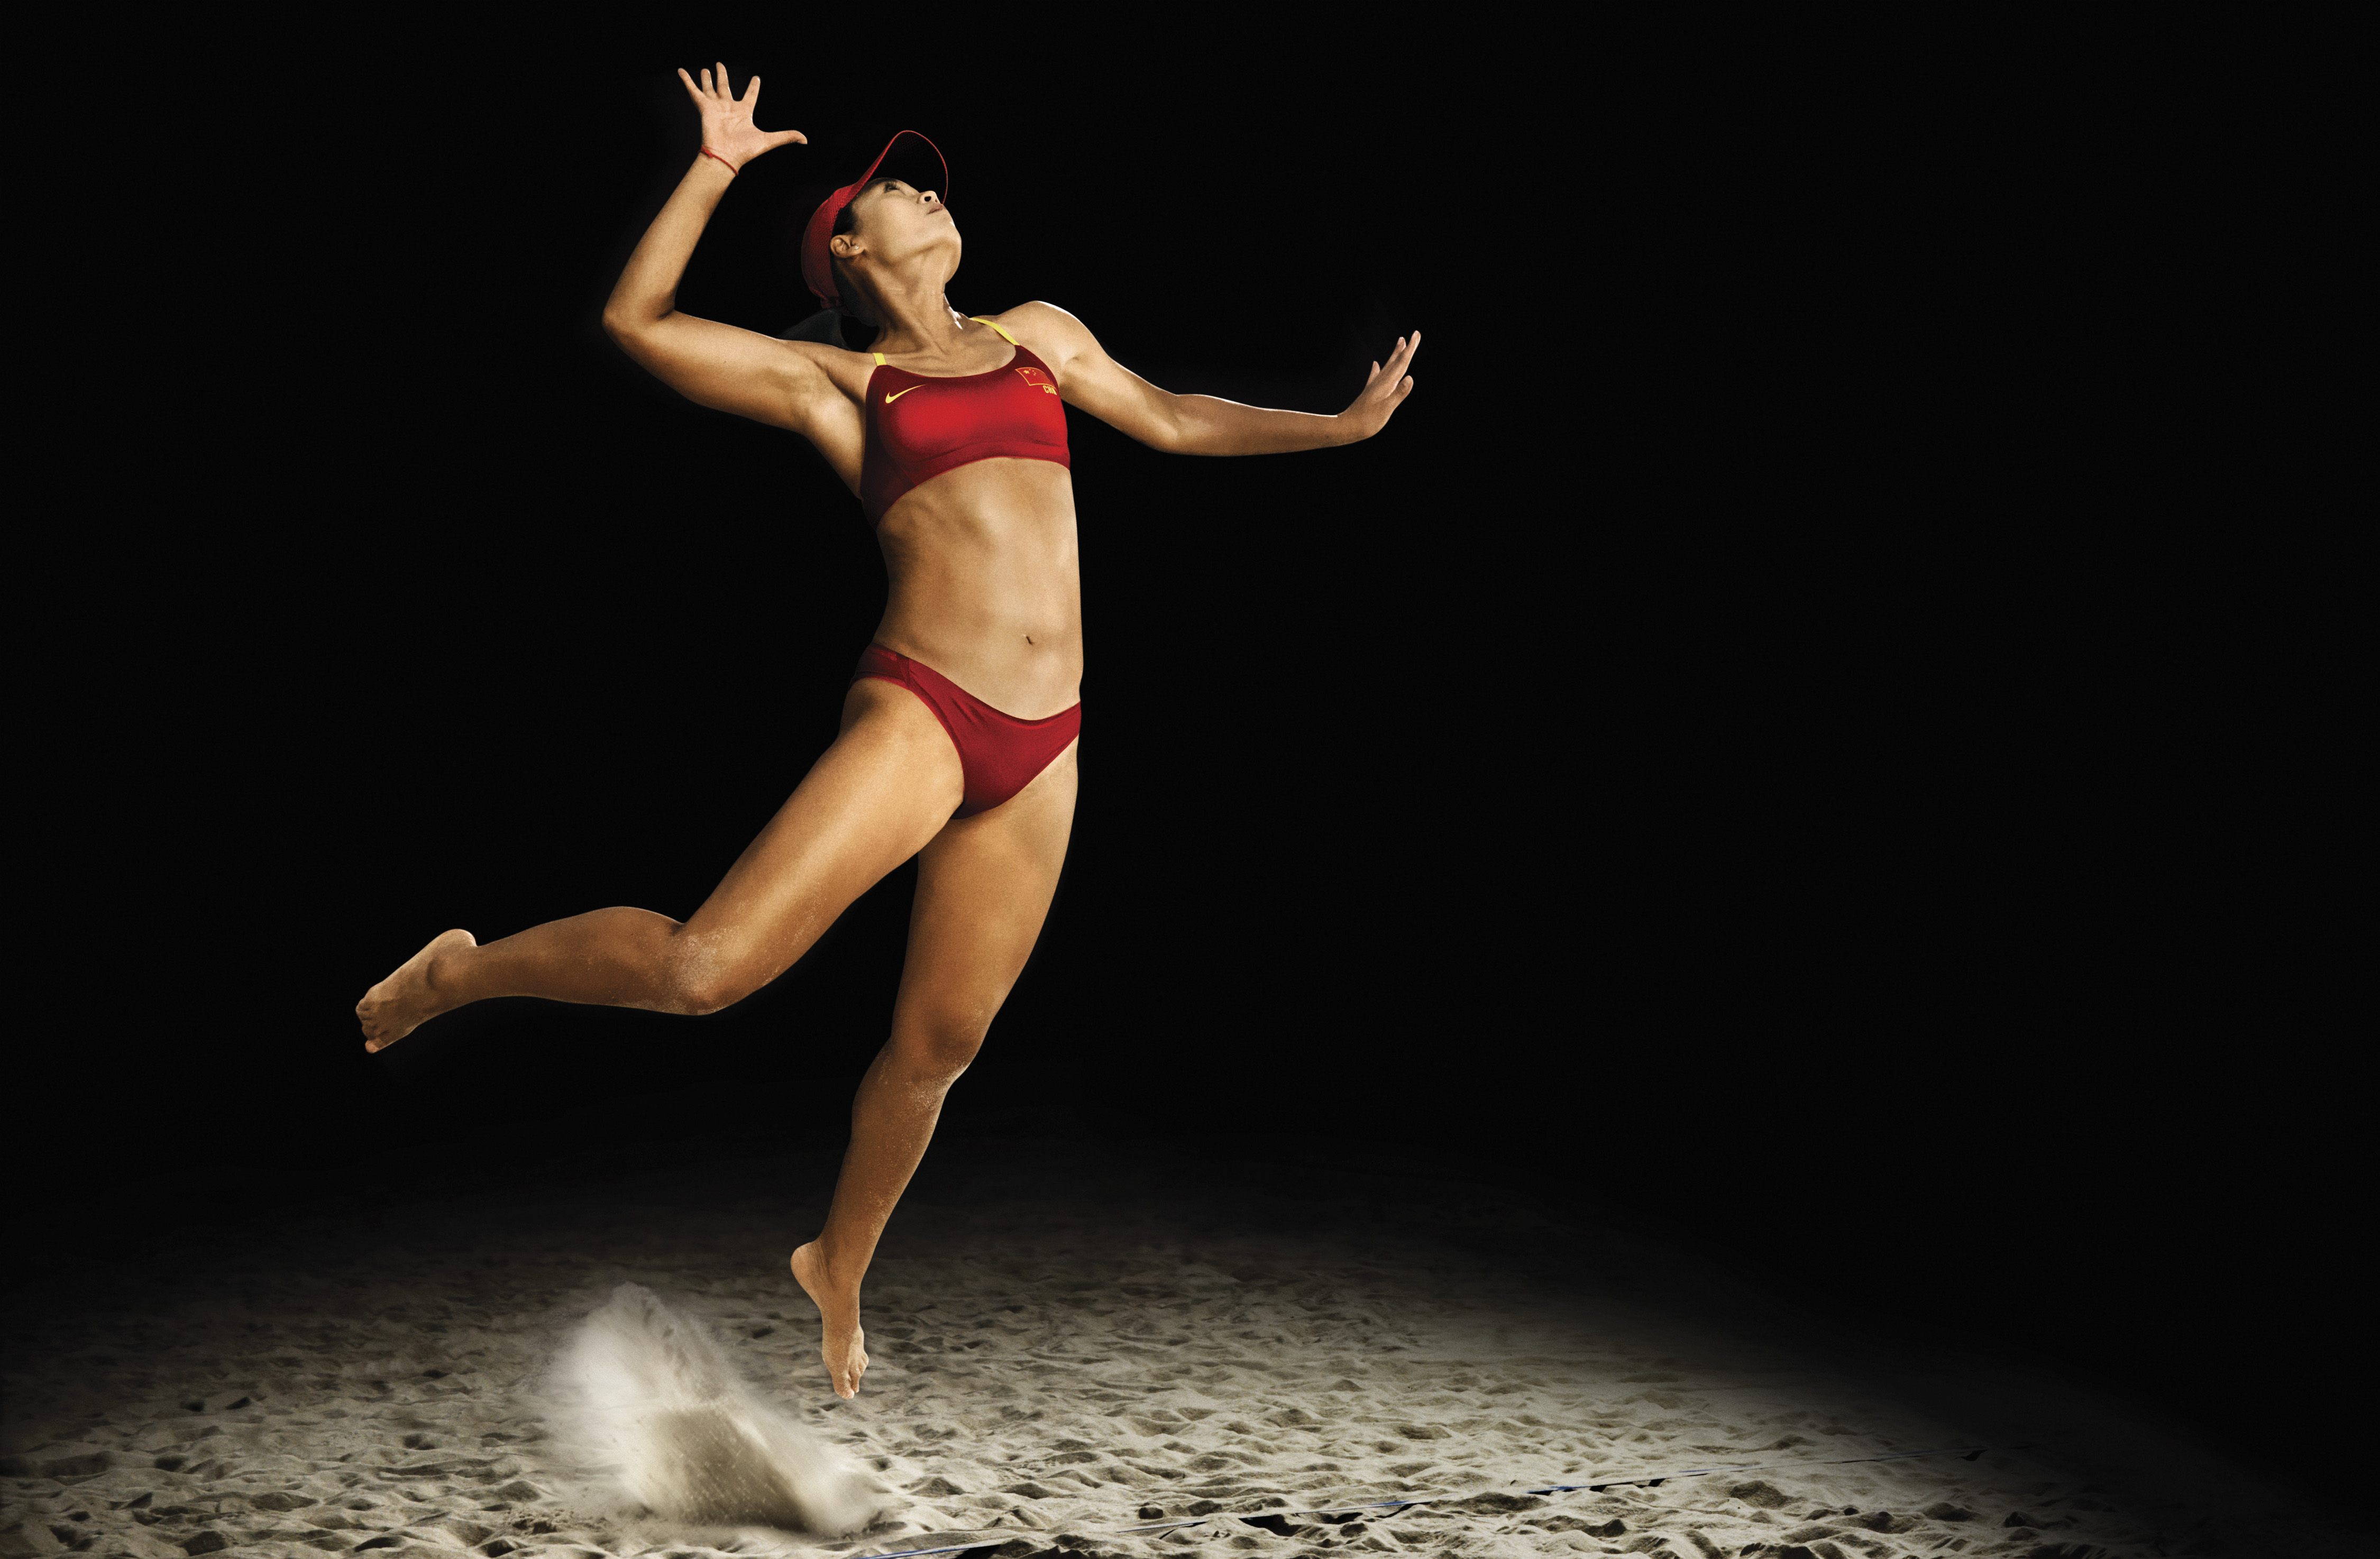 Beach Volleyball Hd photo & image